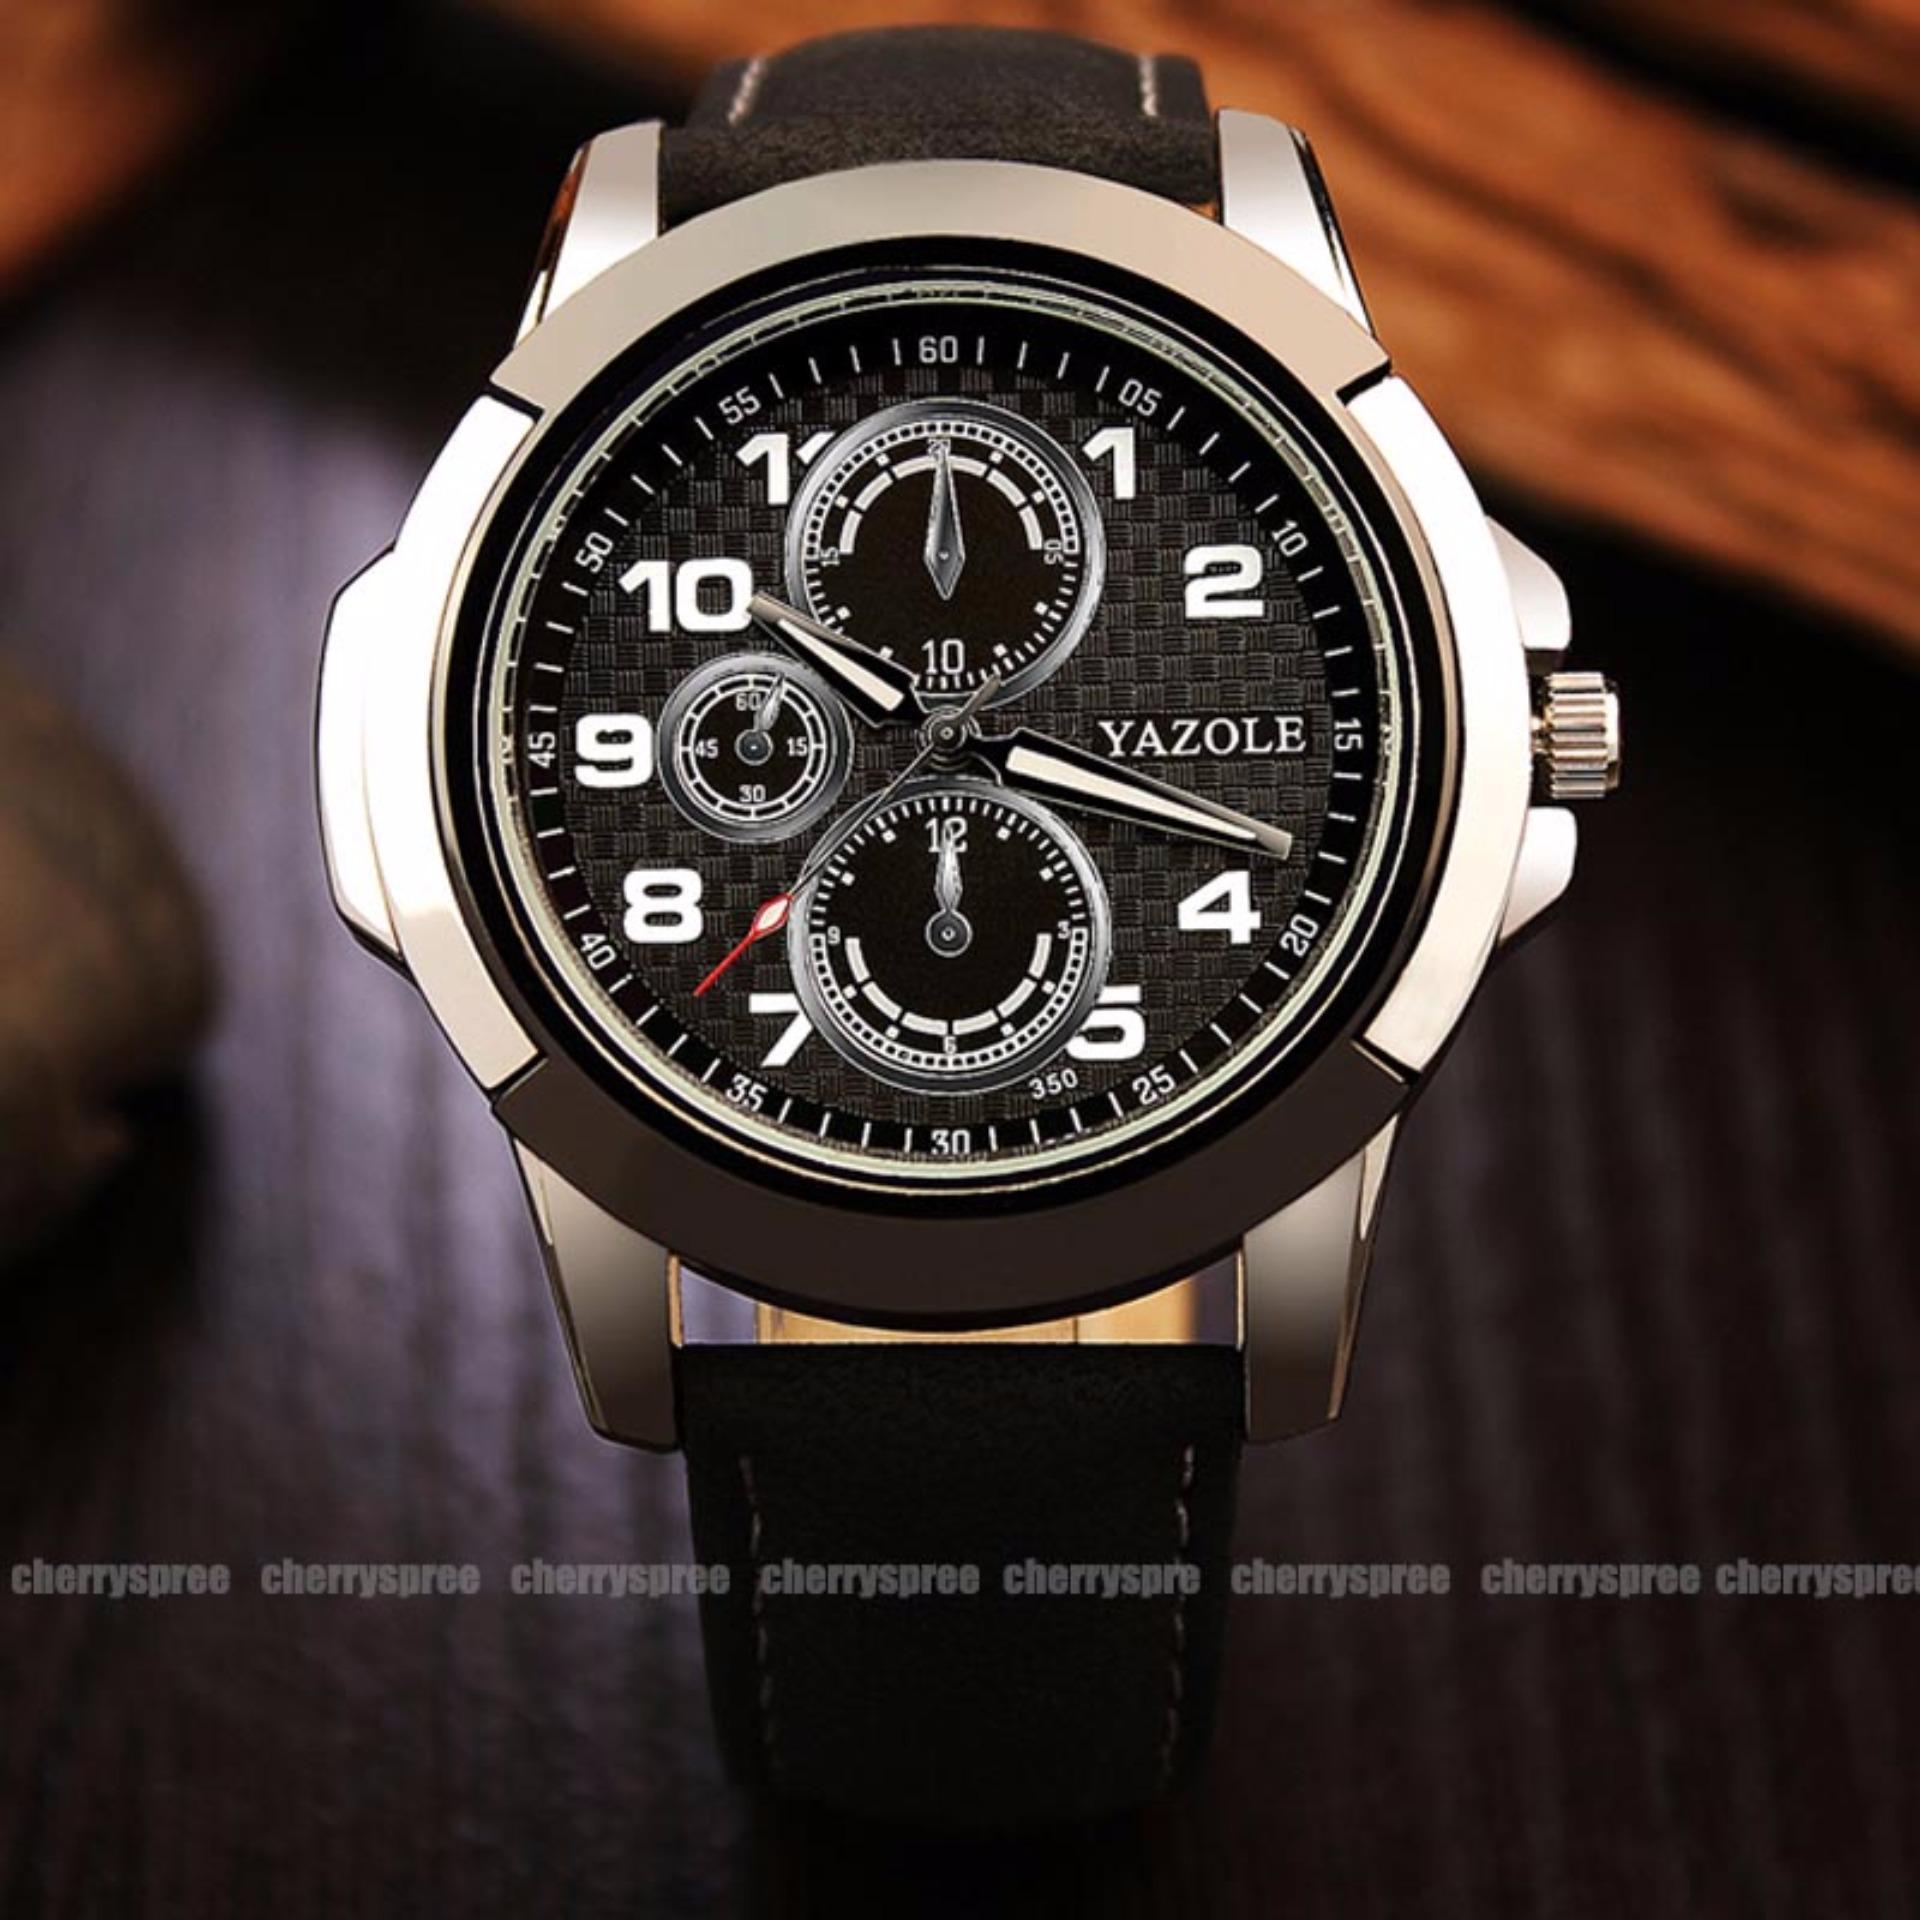 Harga Baru Yazole Original Barcelona Yz350 Jam Tangan Kulit Pria Top 296 Business Quartz Watches Black Dial Luxury Watch Men Male